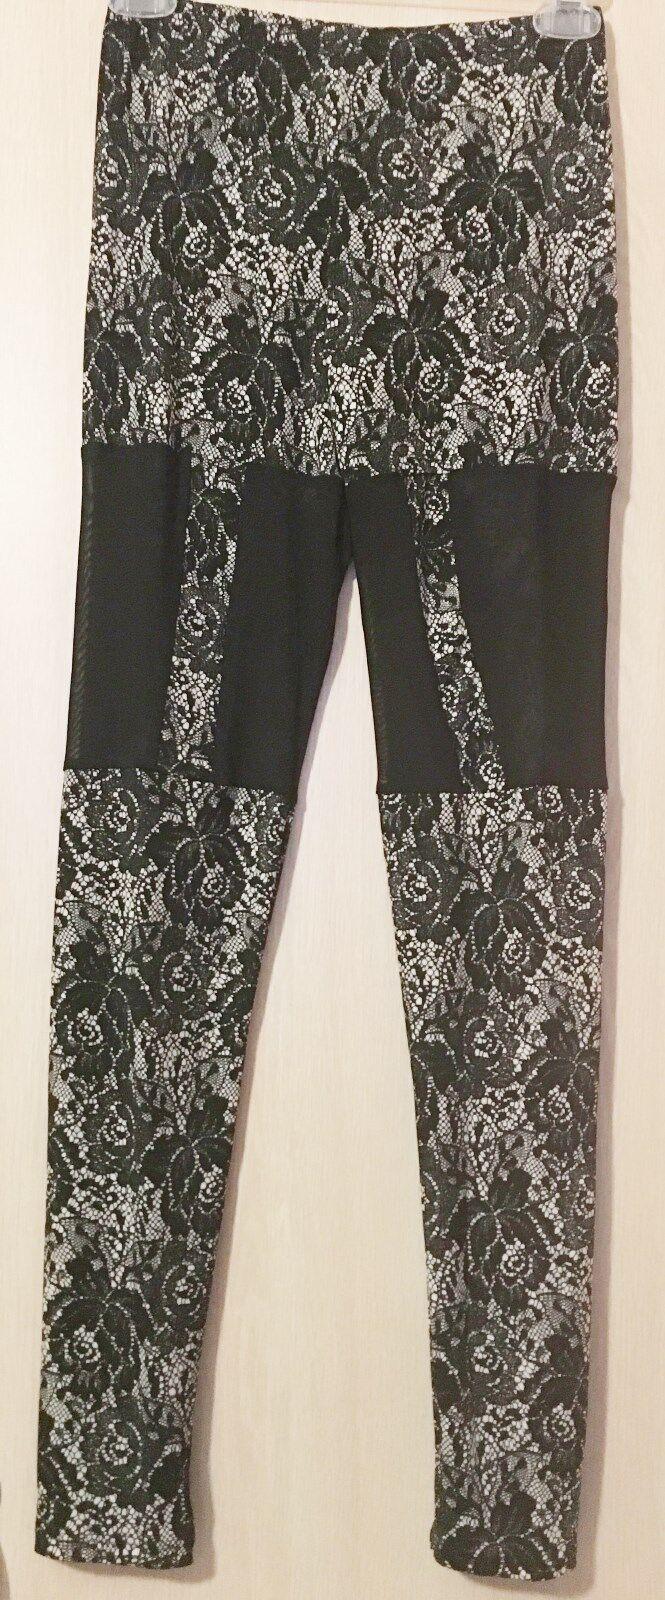 AKIRA Floral Lace Print Motif Design Sheer Mesh Insert Stretch Pants Leggings S